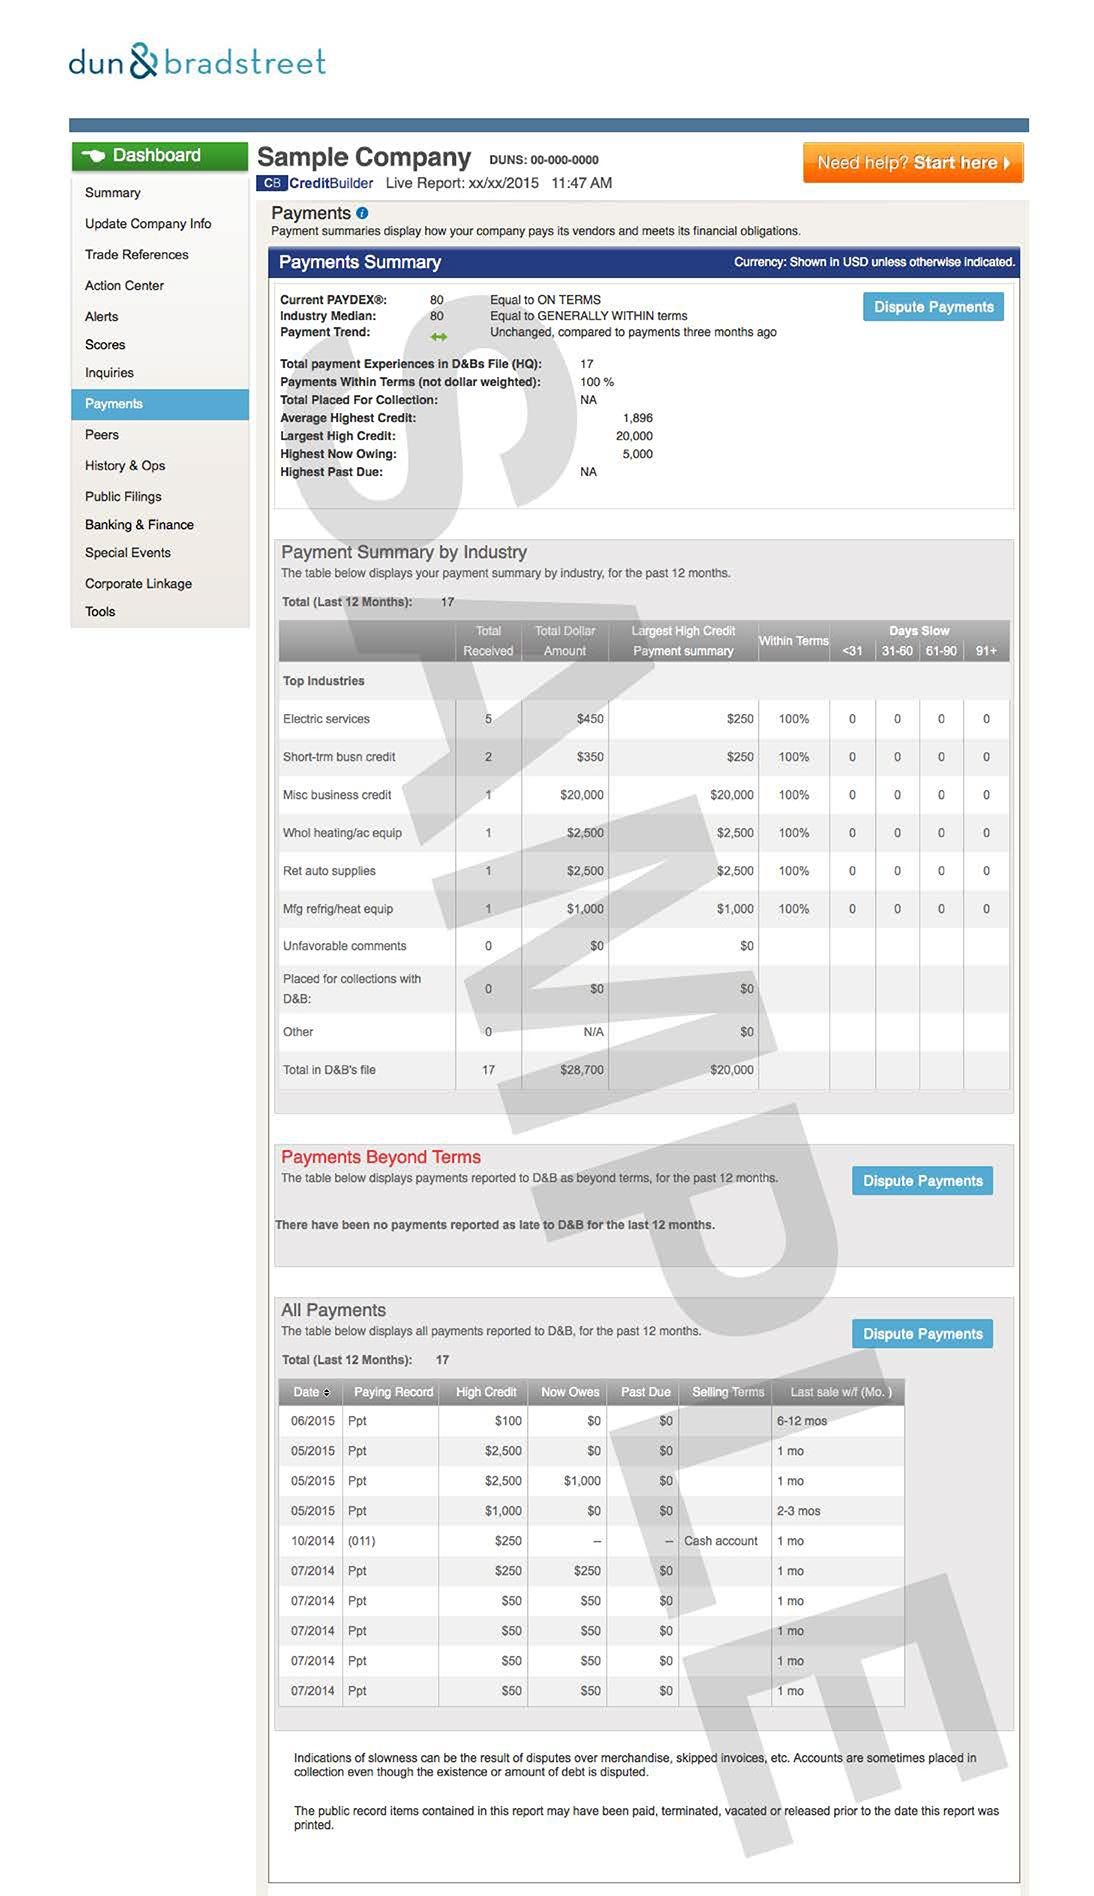 creditbuilder-sample-reportEr2